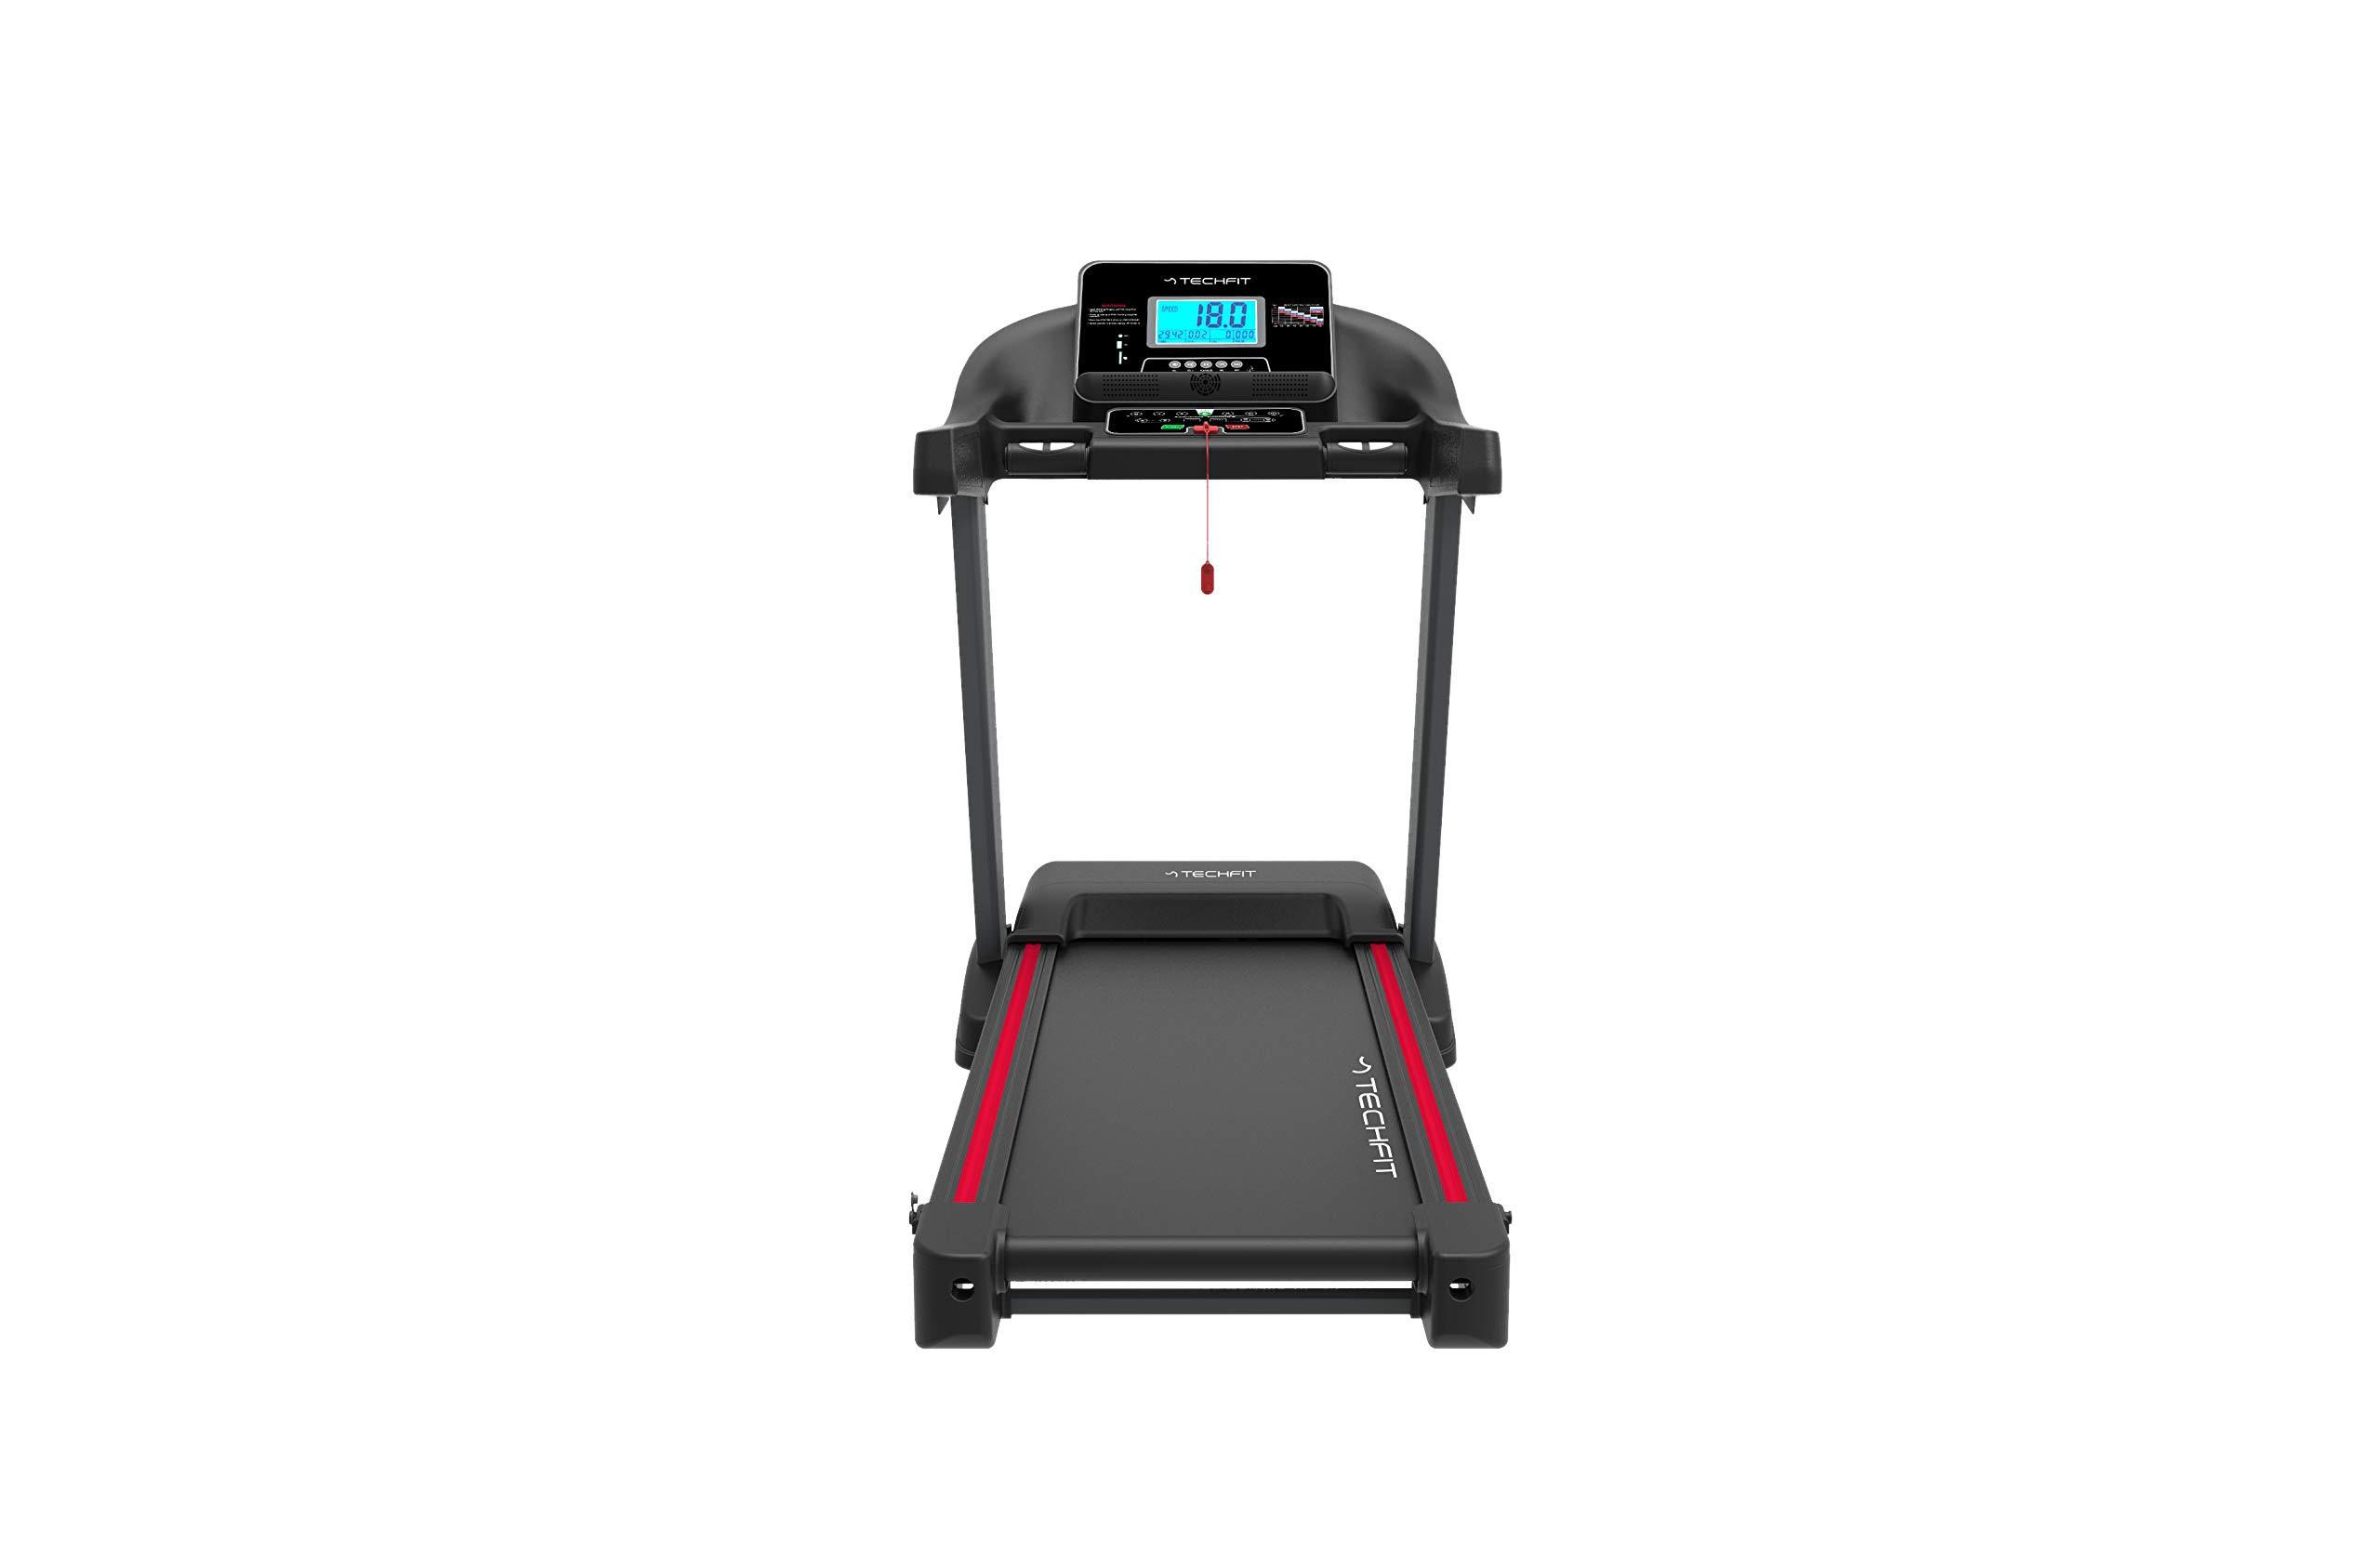 TechFit MT200 Tapis Roulant Professionale, Autolubrificazione, 5.0 HP, Fitness App, Bluetooth, Sistema di Piegatura… 2 spesavip